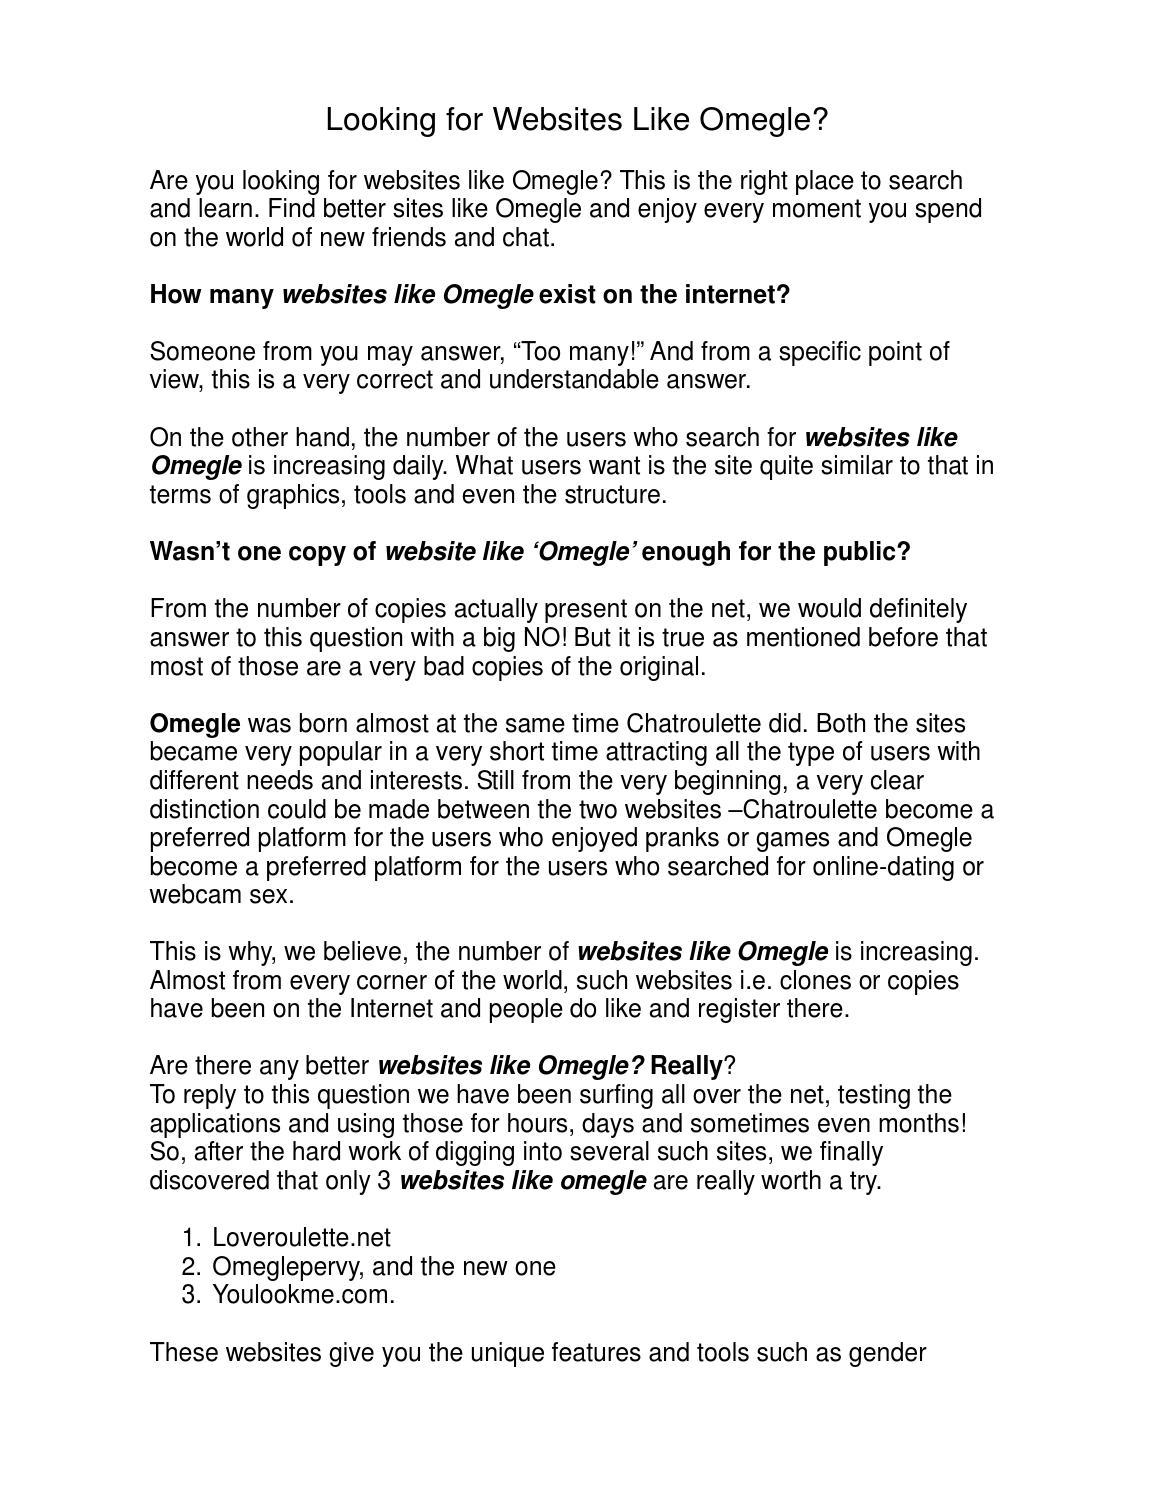 Websites like omegle but better